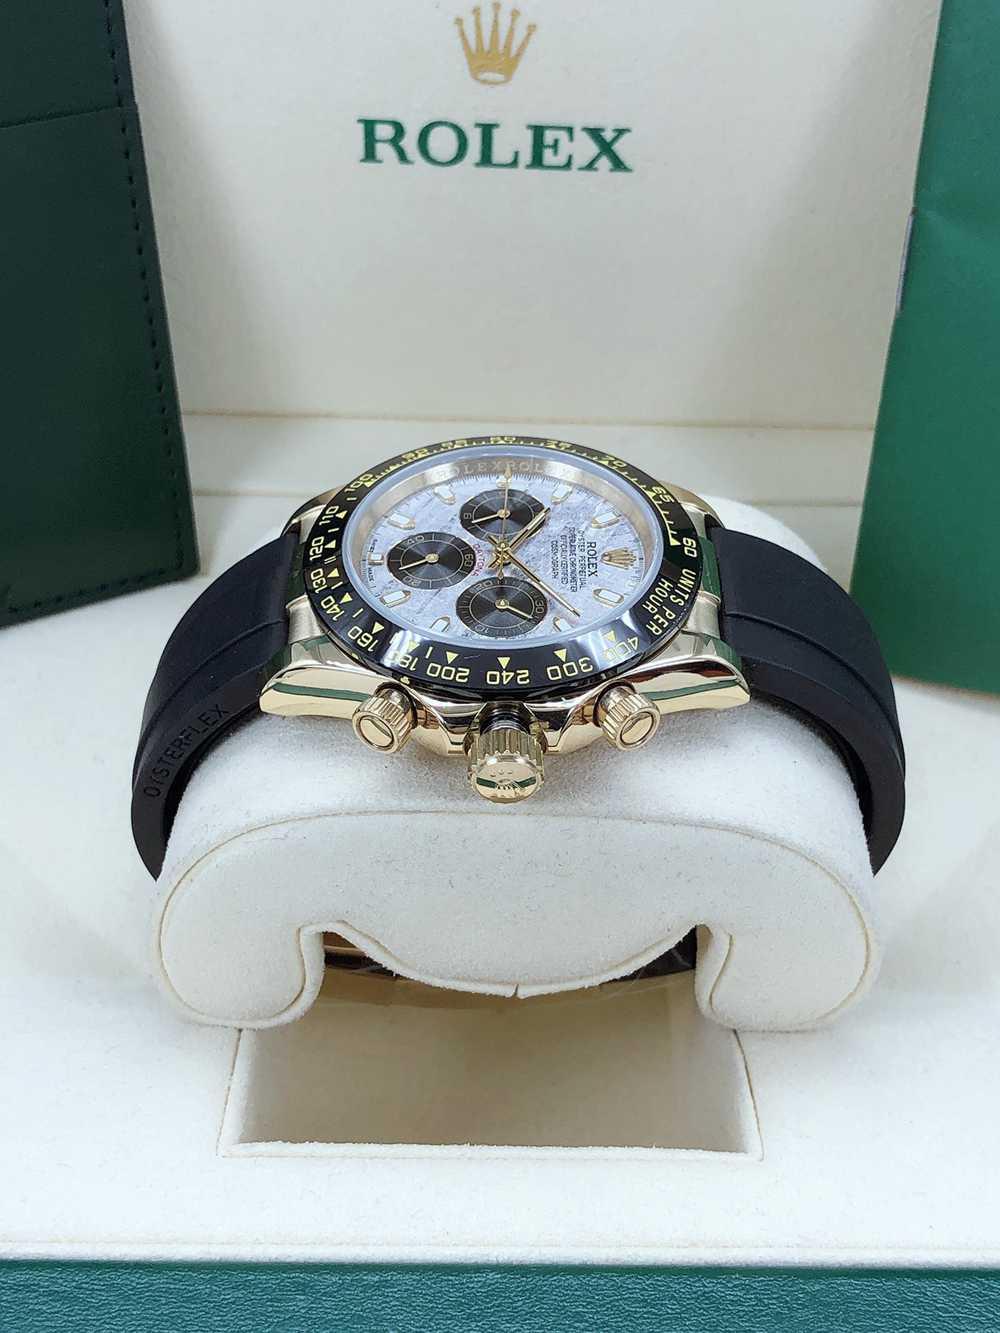 Daytona meteorite dial gold case 40mm black Oysterflex rubber strap AAA automatic 2813 men's